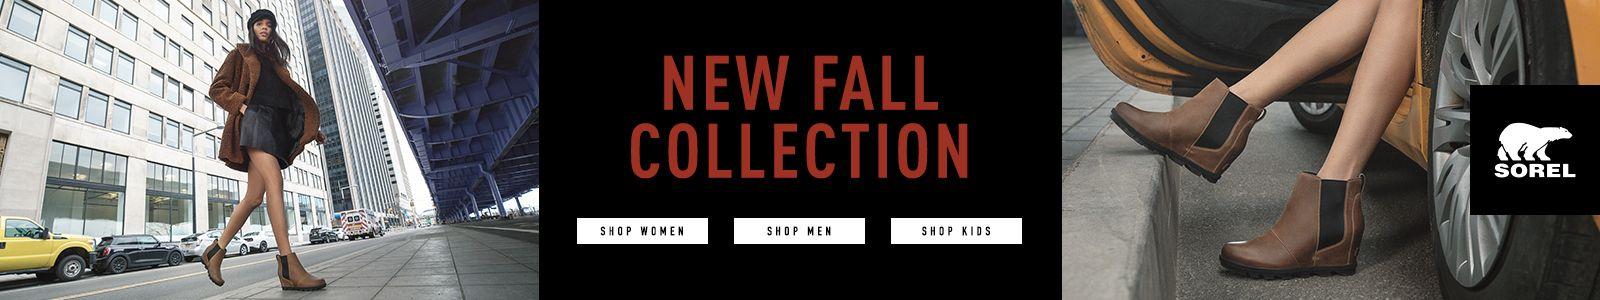 New Fall Collection, Shop Women, Shop men, Shop Kids, Sorel